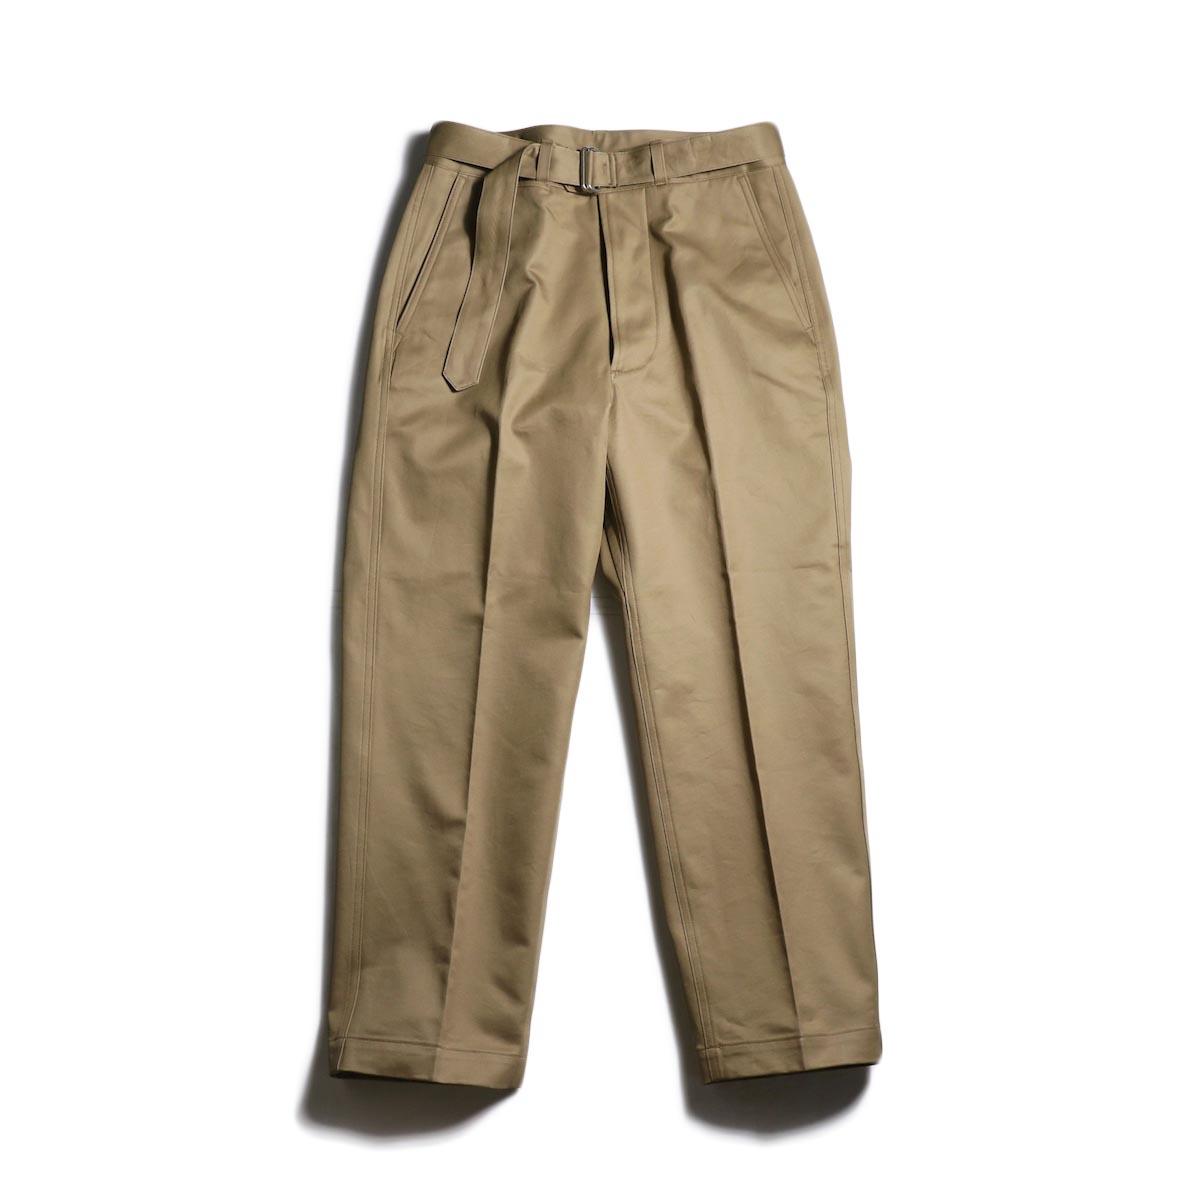 Kaptain Sunshine / Belted Work Trousers (Khaki)